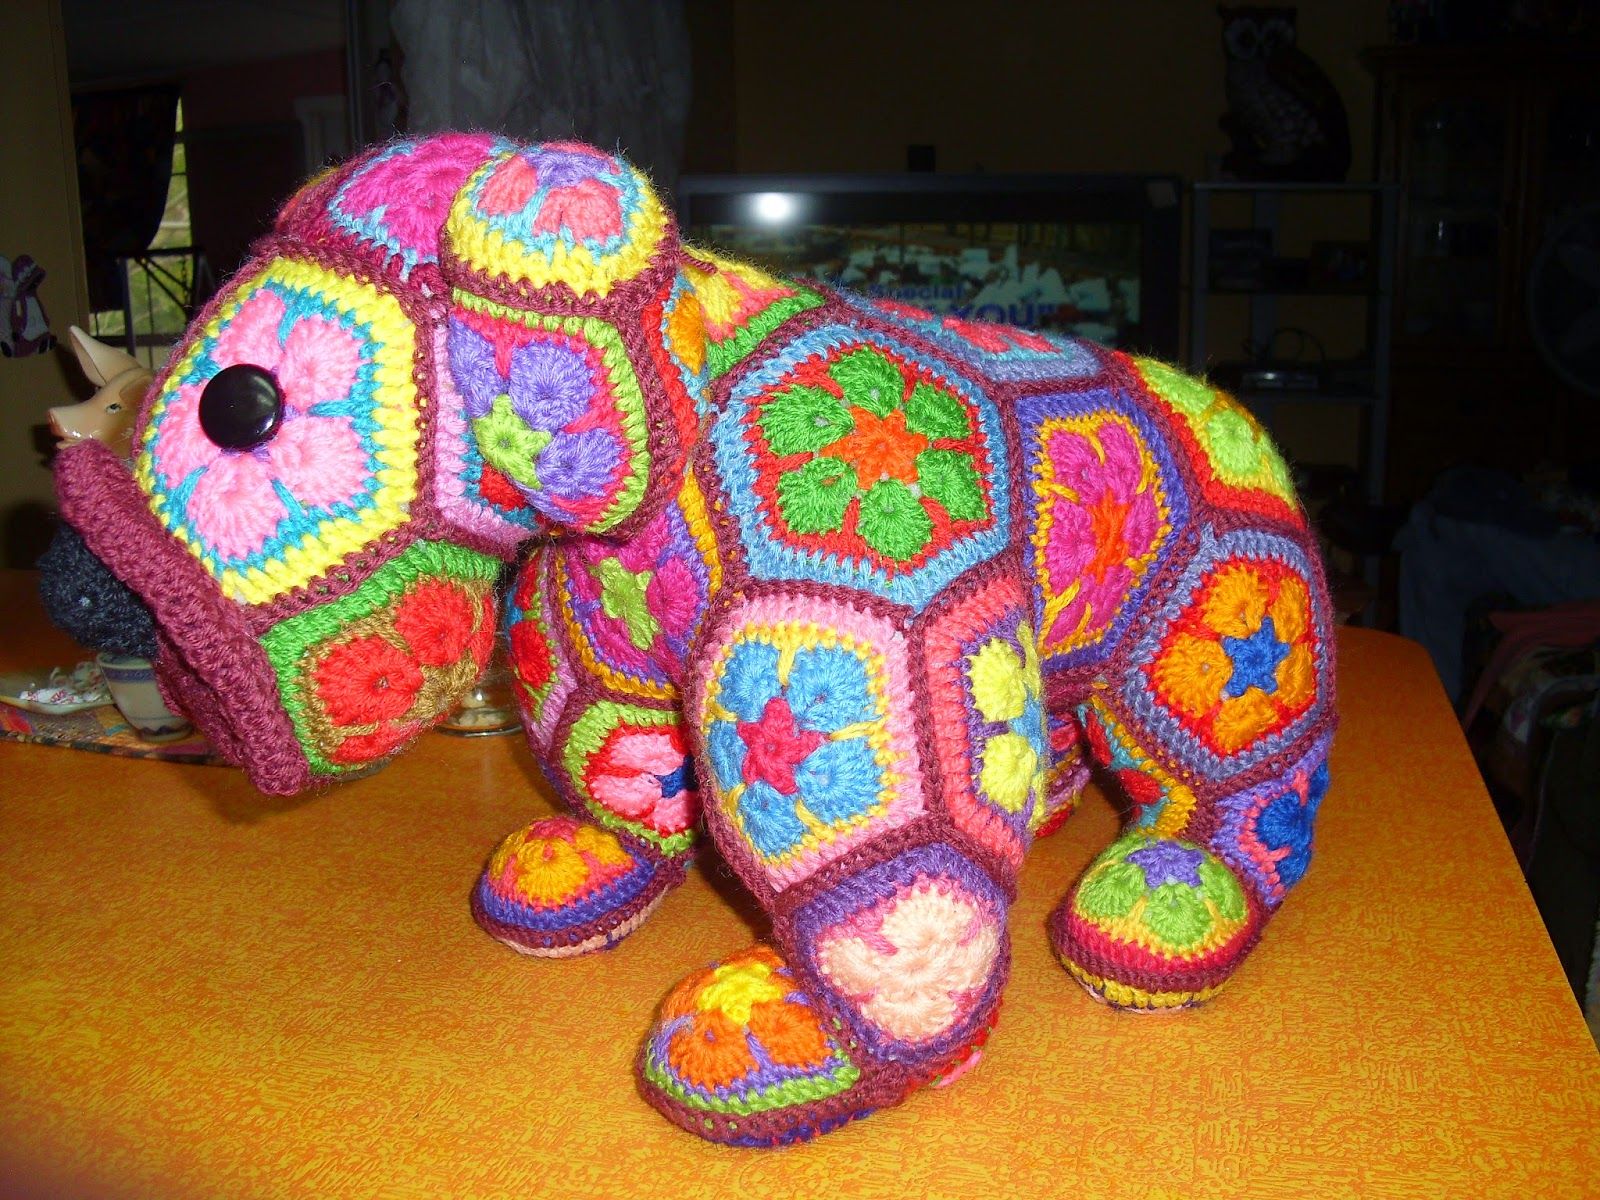 Amazon.com: Elephant Soft Toy. African Flower Crocheted Elephant ... | 1200x1600